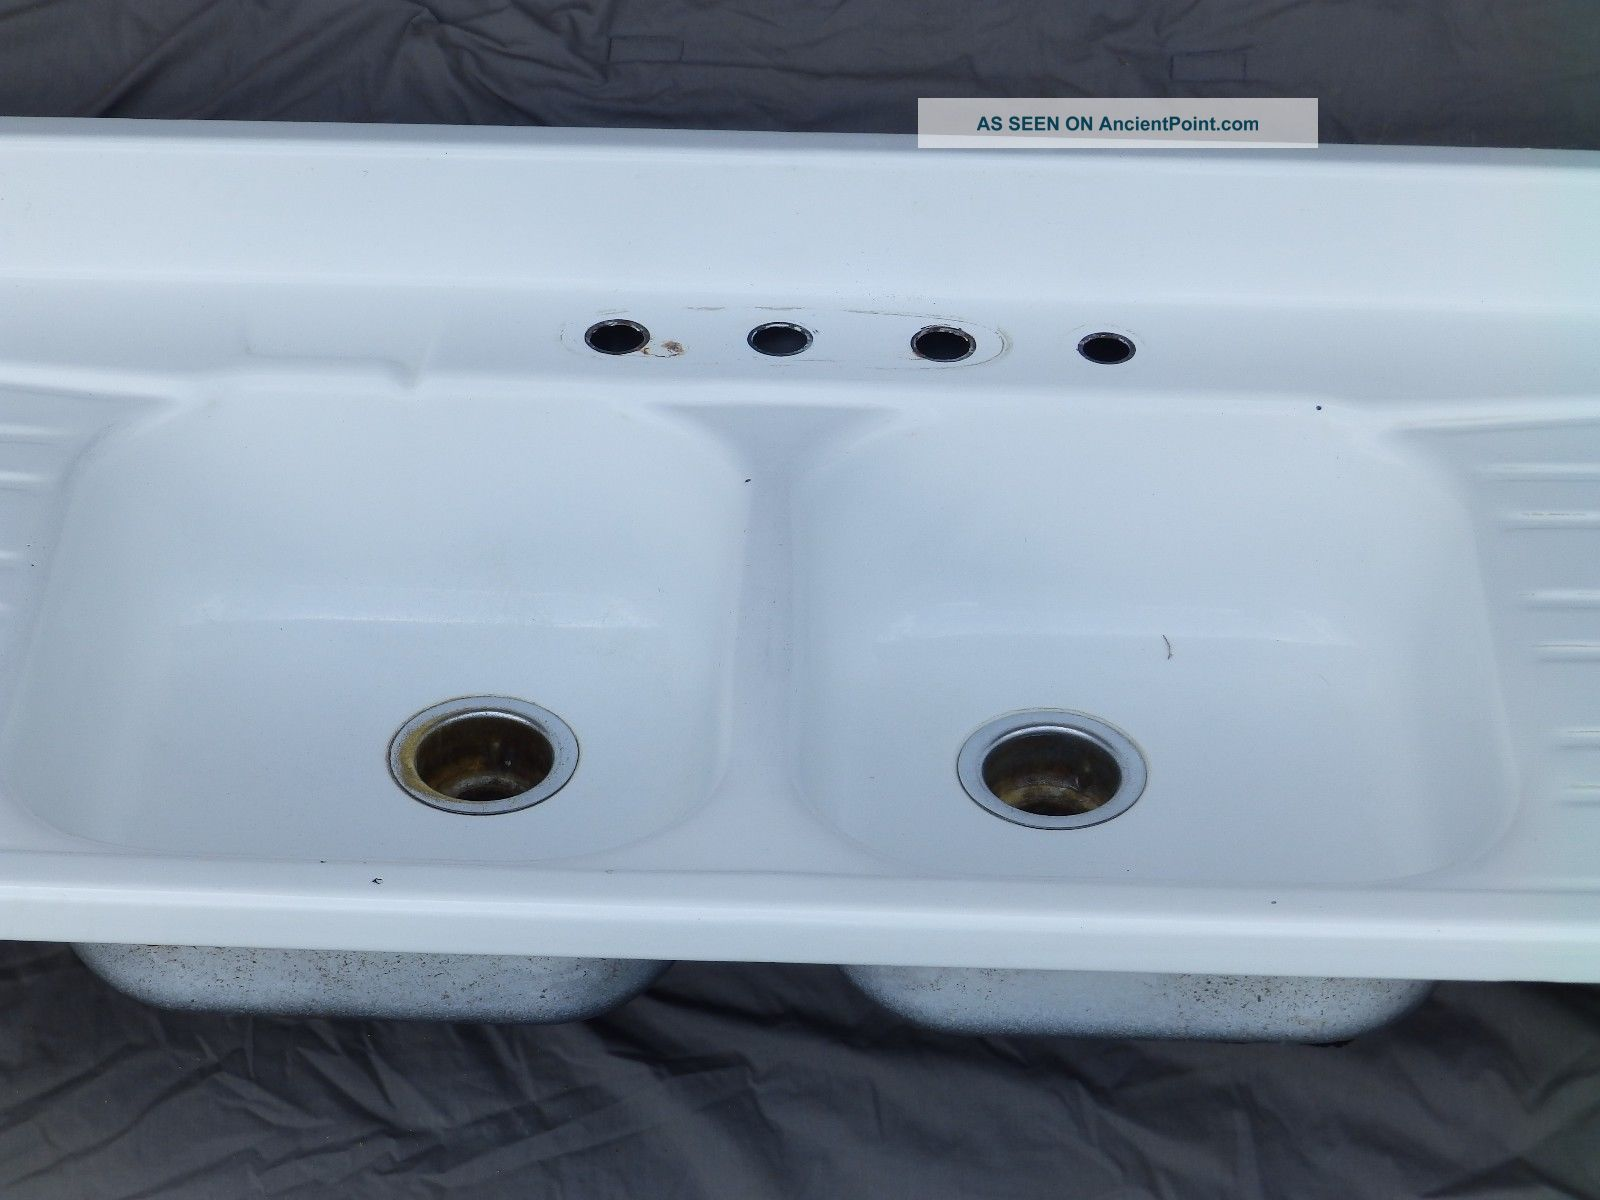 Vintage Steel White Porcelain Double Basin Drainboard Old Kitchen Sink 1040 16